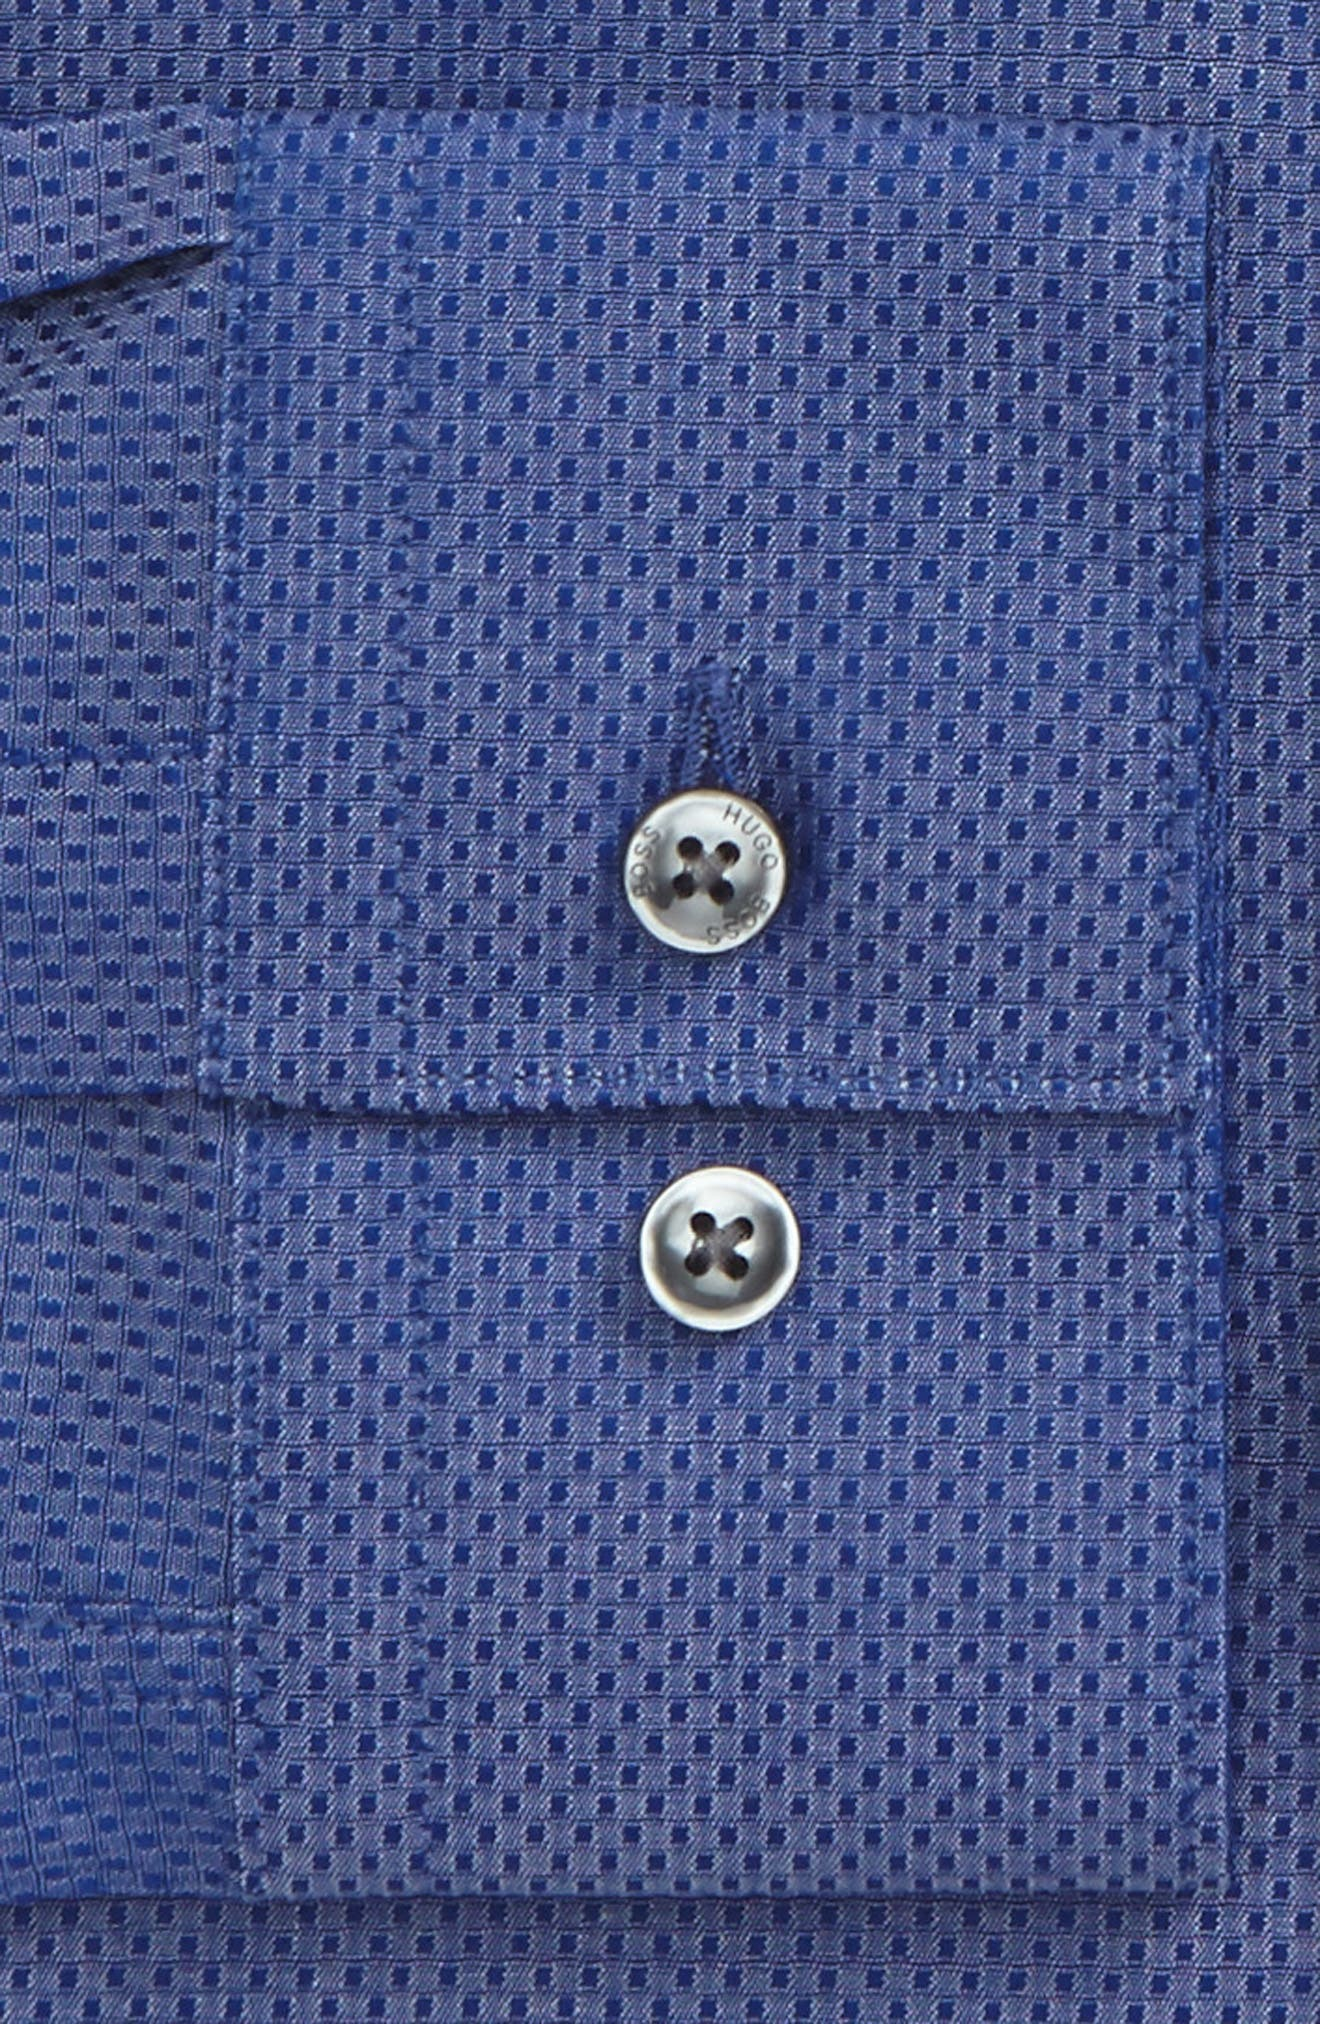 Isko Slim Fit Textured Dress Shirt,                             Alternate thumbnail 2, color,                             421